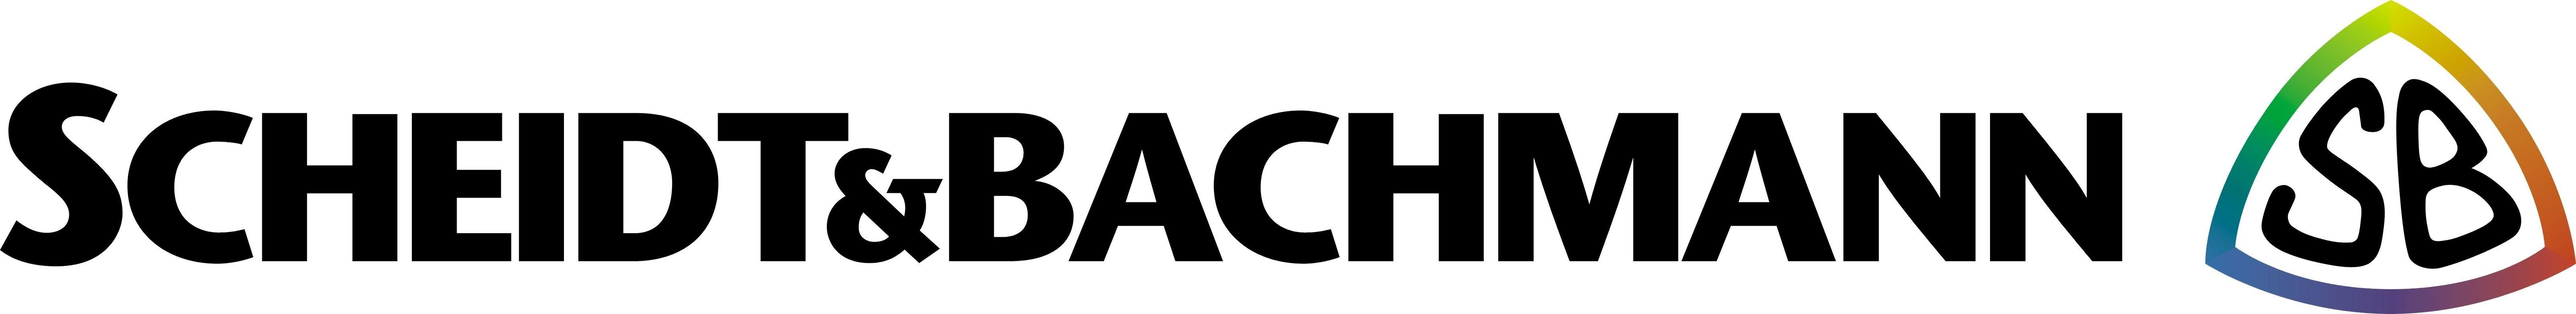 Scheidt & Bachmann_Logo_600dpi